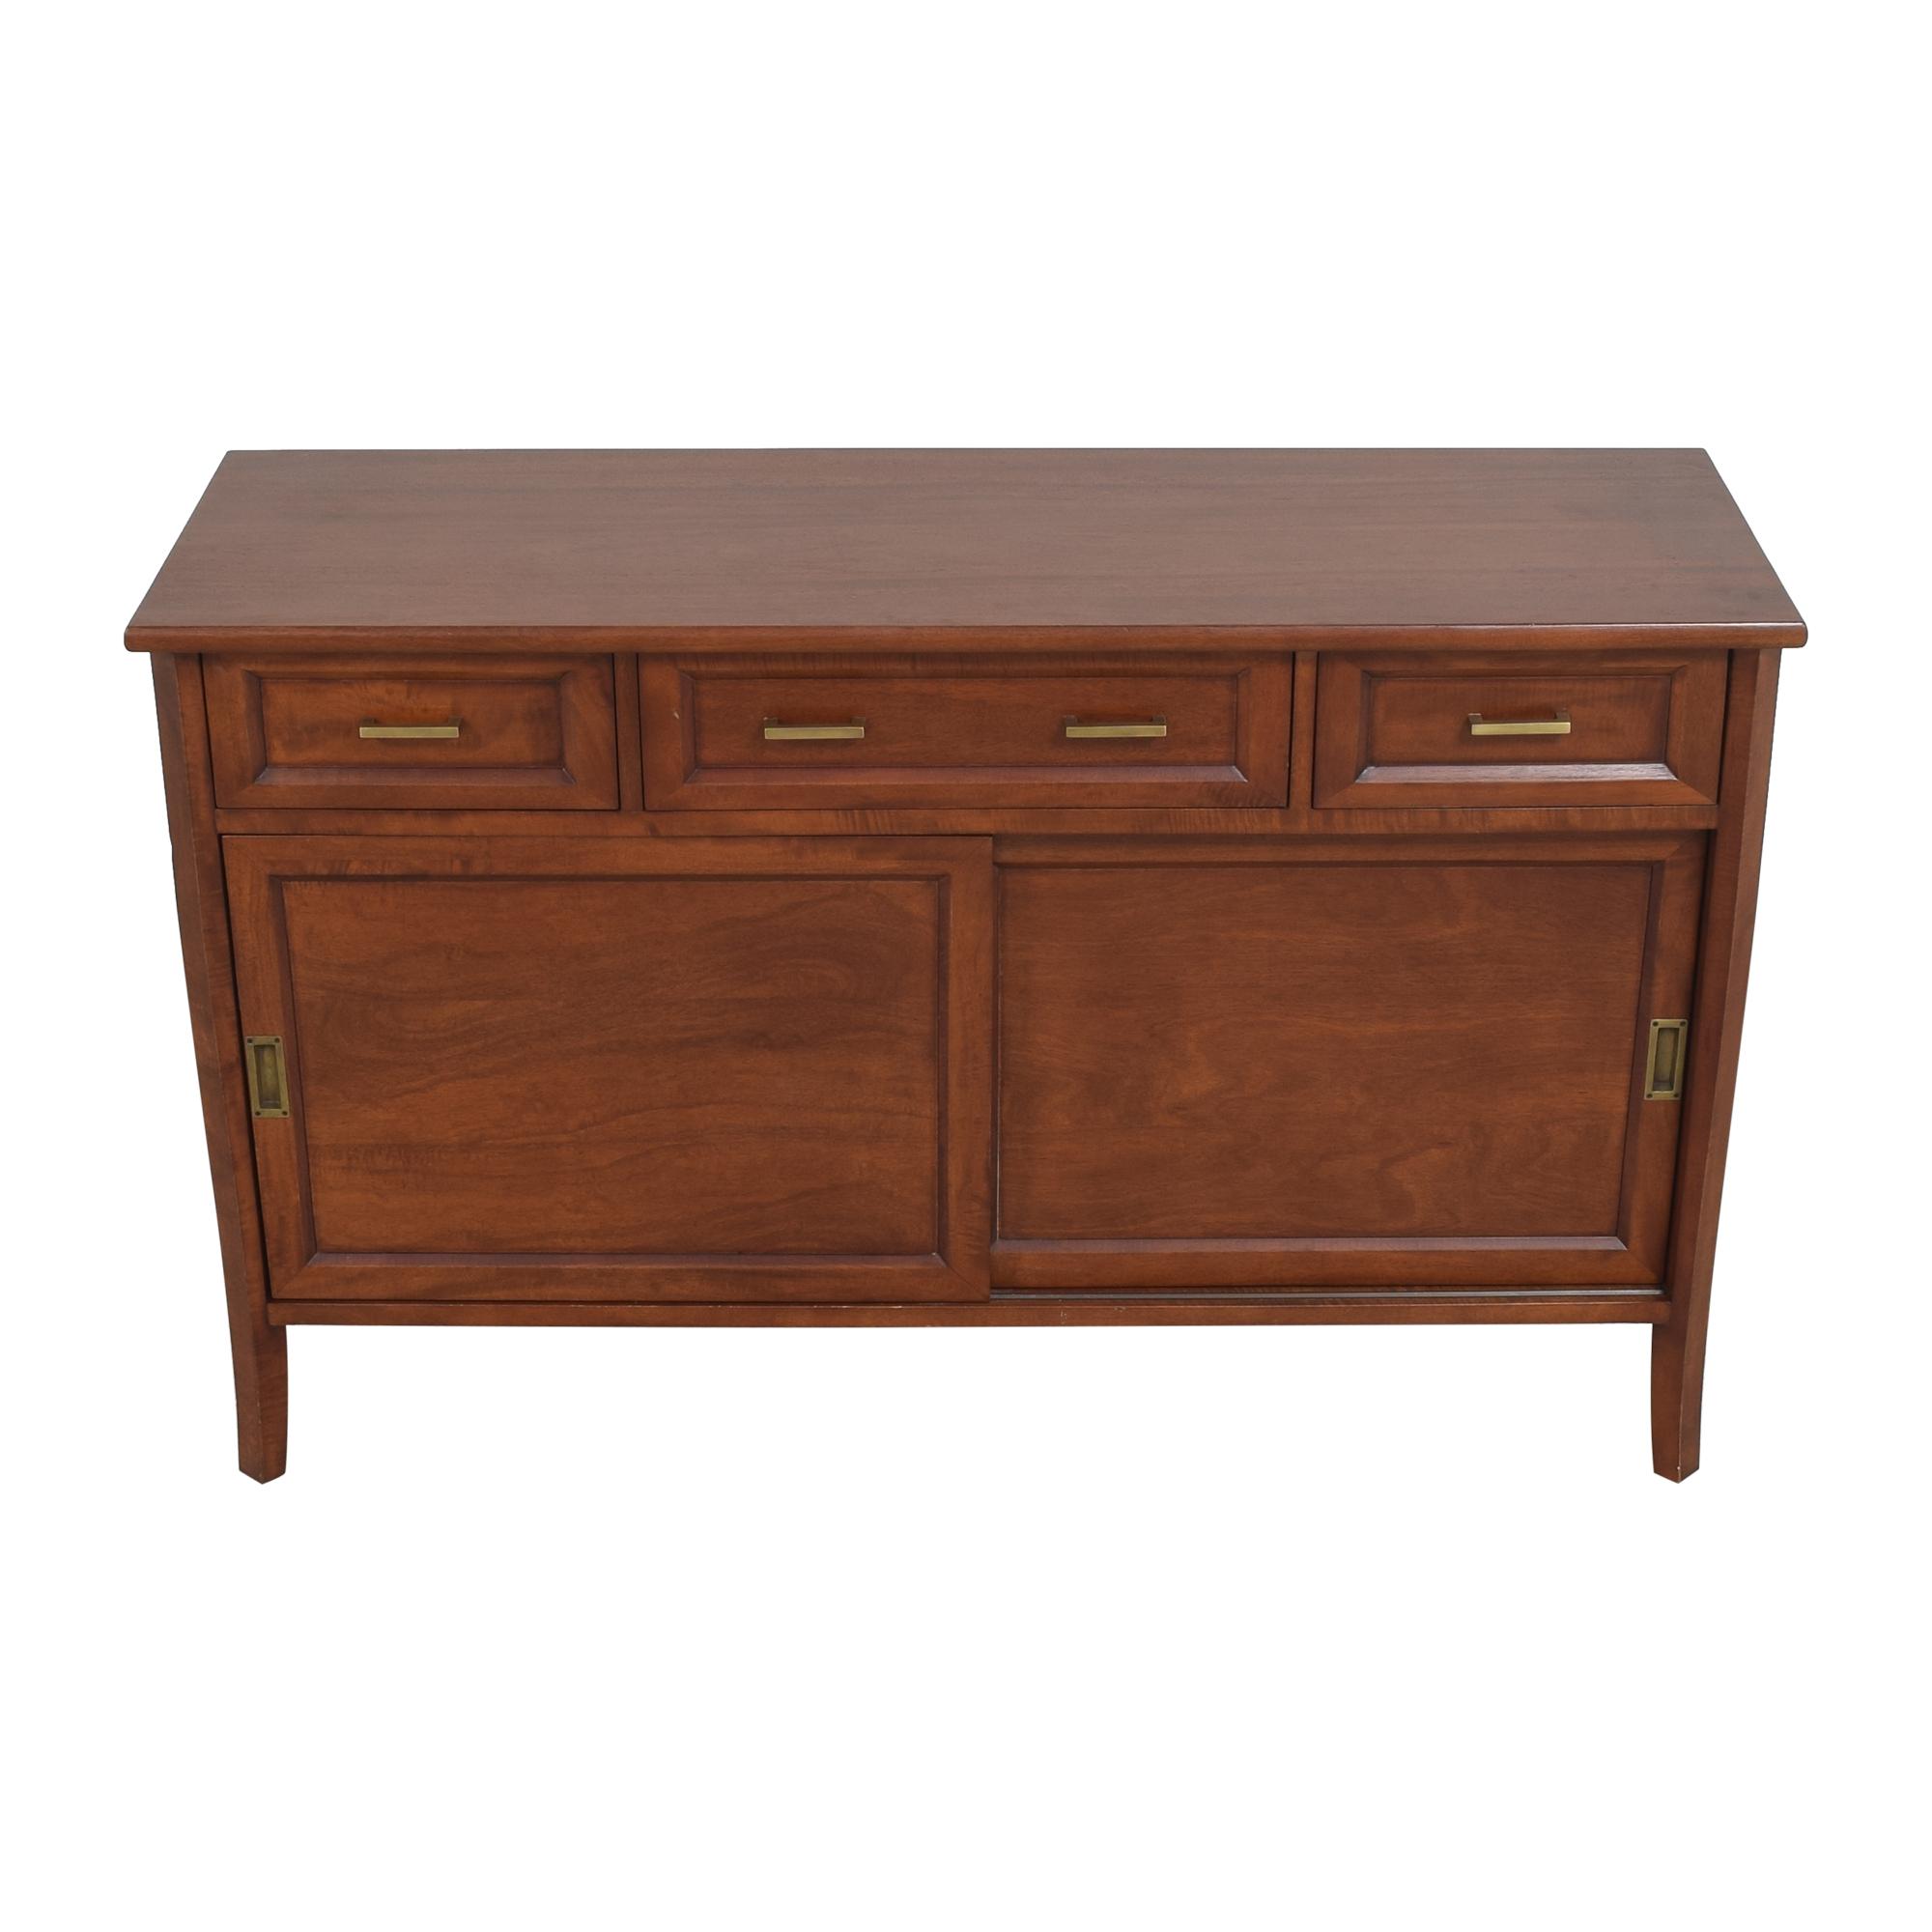 Crate & Barrel Sliding Door Console / Cabinets & Sideboards